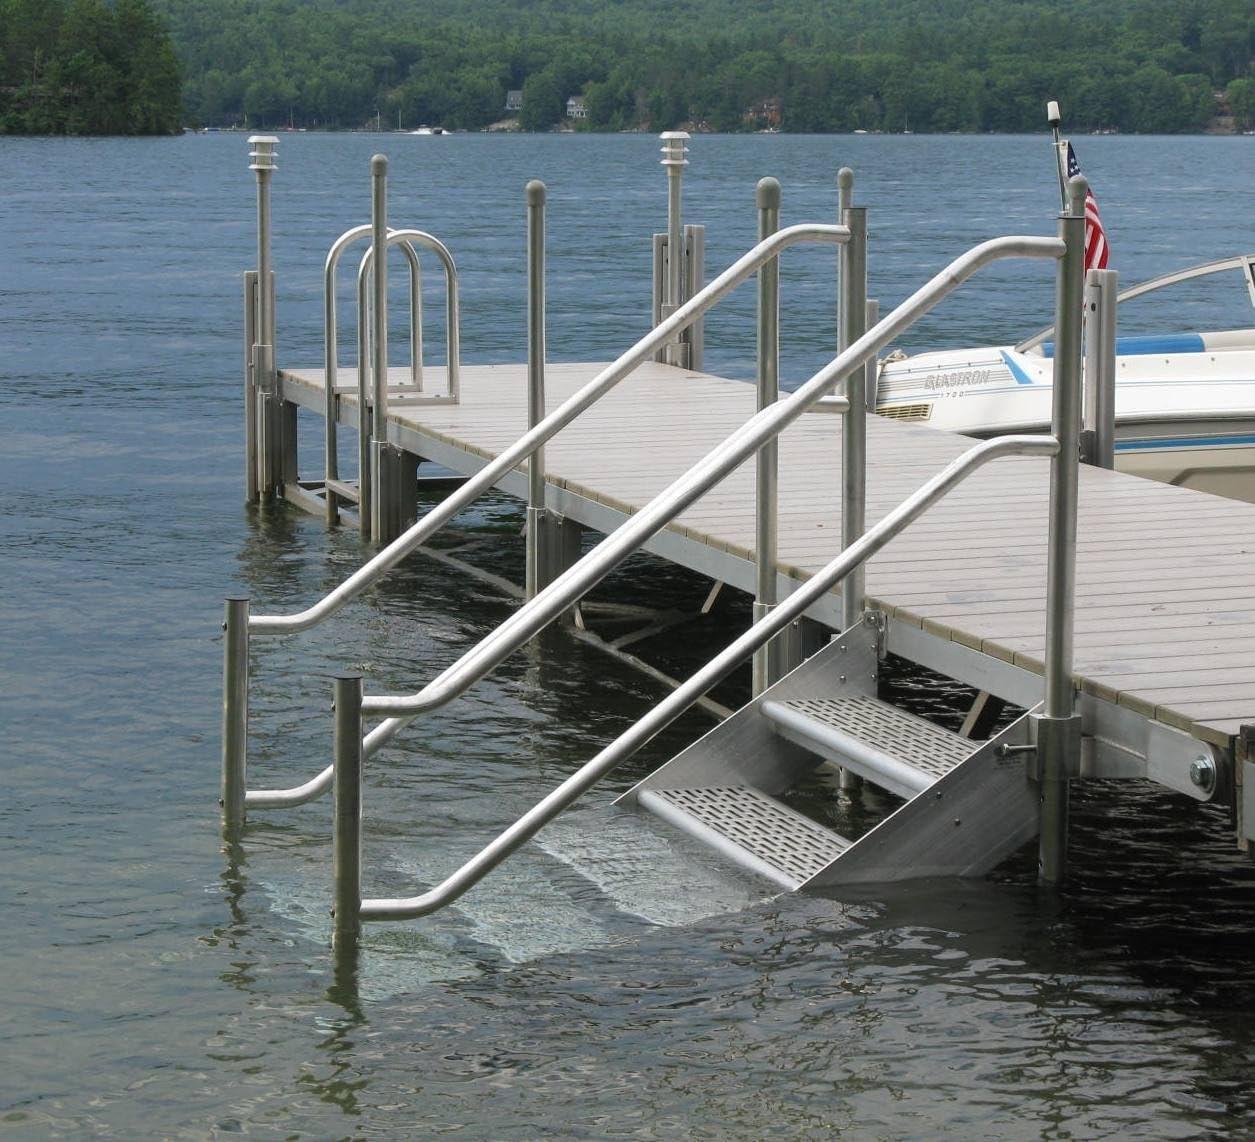 Amazon Com Ortus Enterprises 4 Step Heavy Duty Aluminum Dock | Aluminum Railings For Steps | Verandah | Glass Railing | Pipe | Indoor | Glass Panel Wooden Handrail